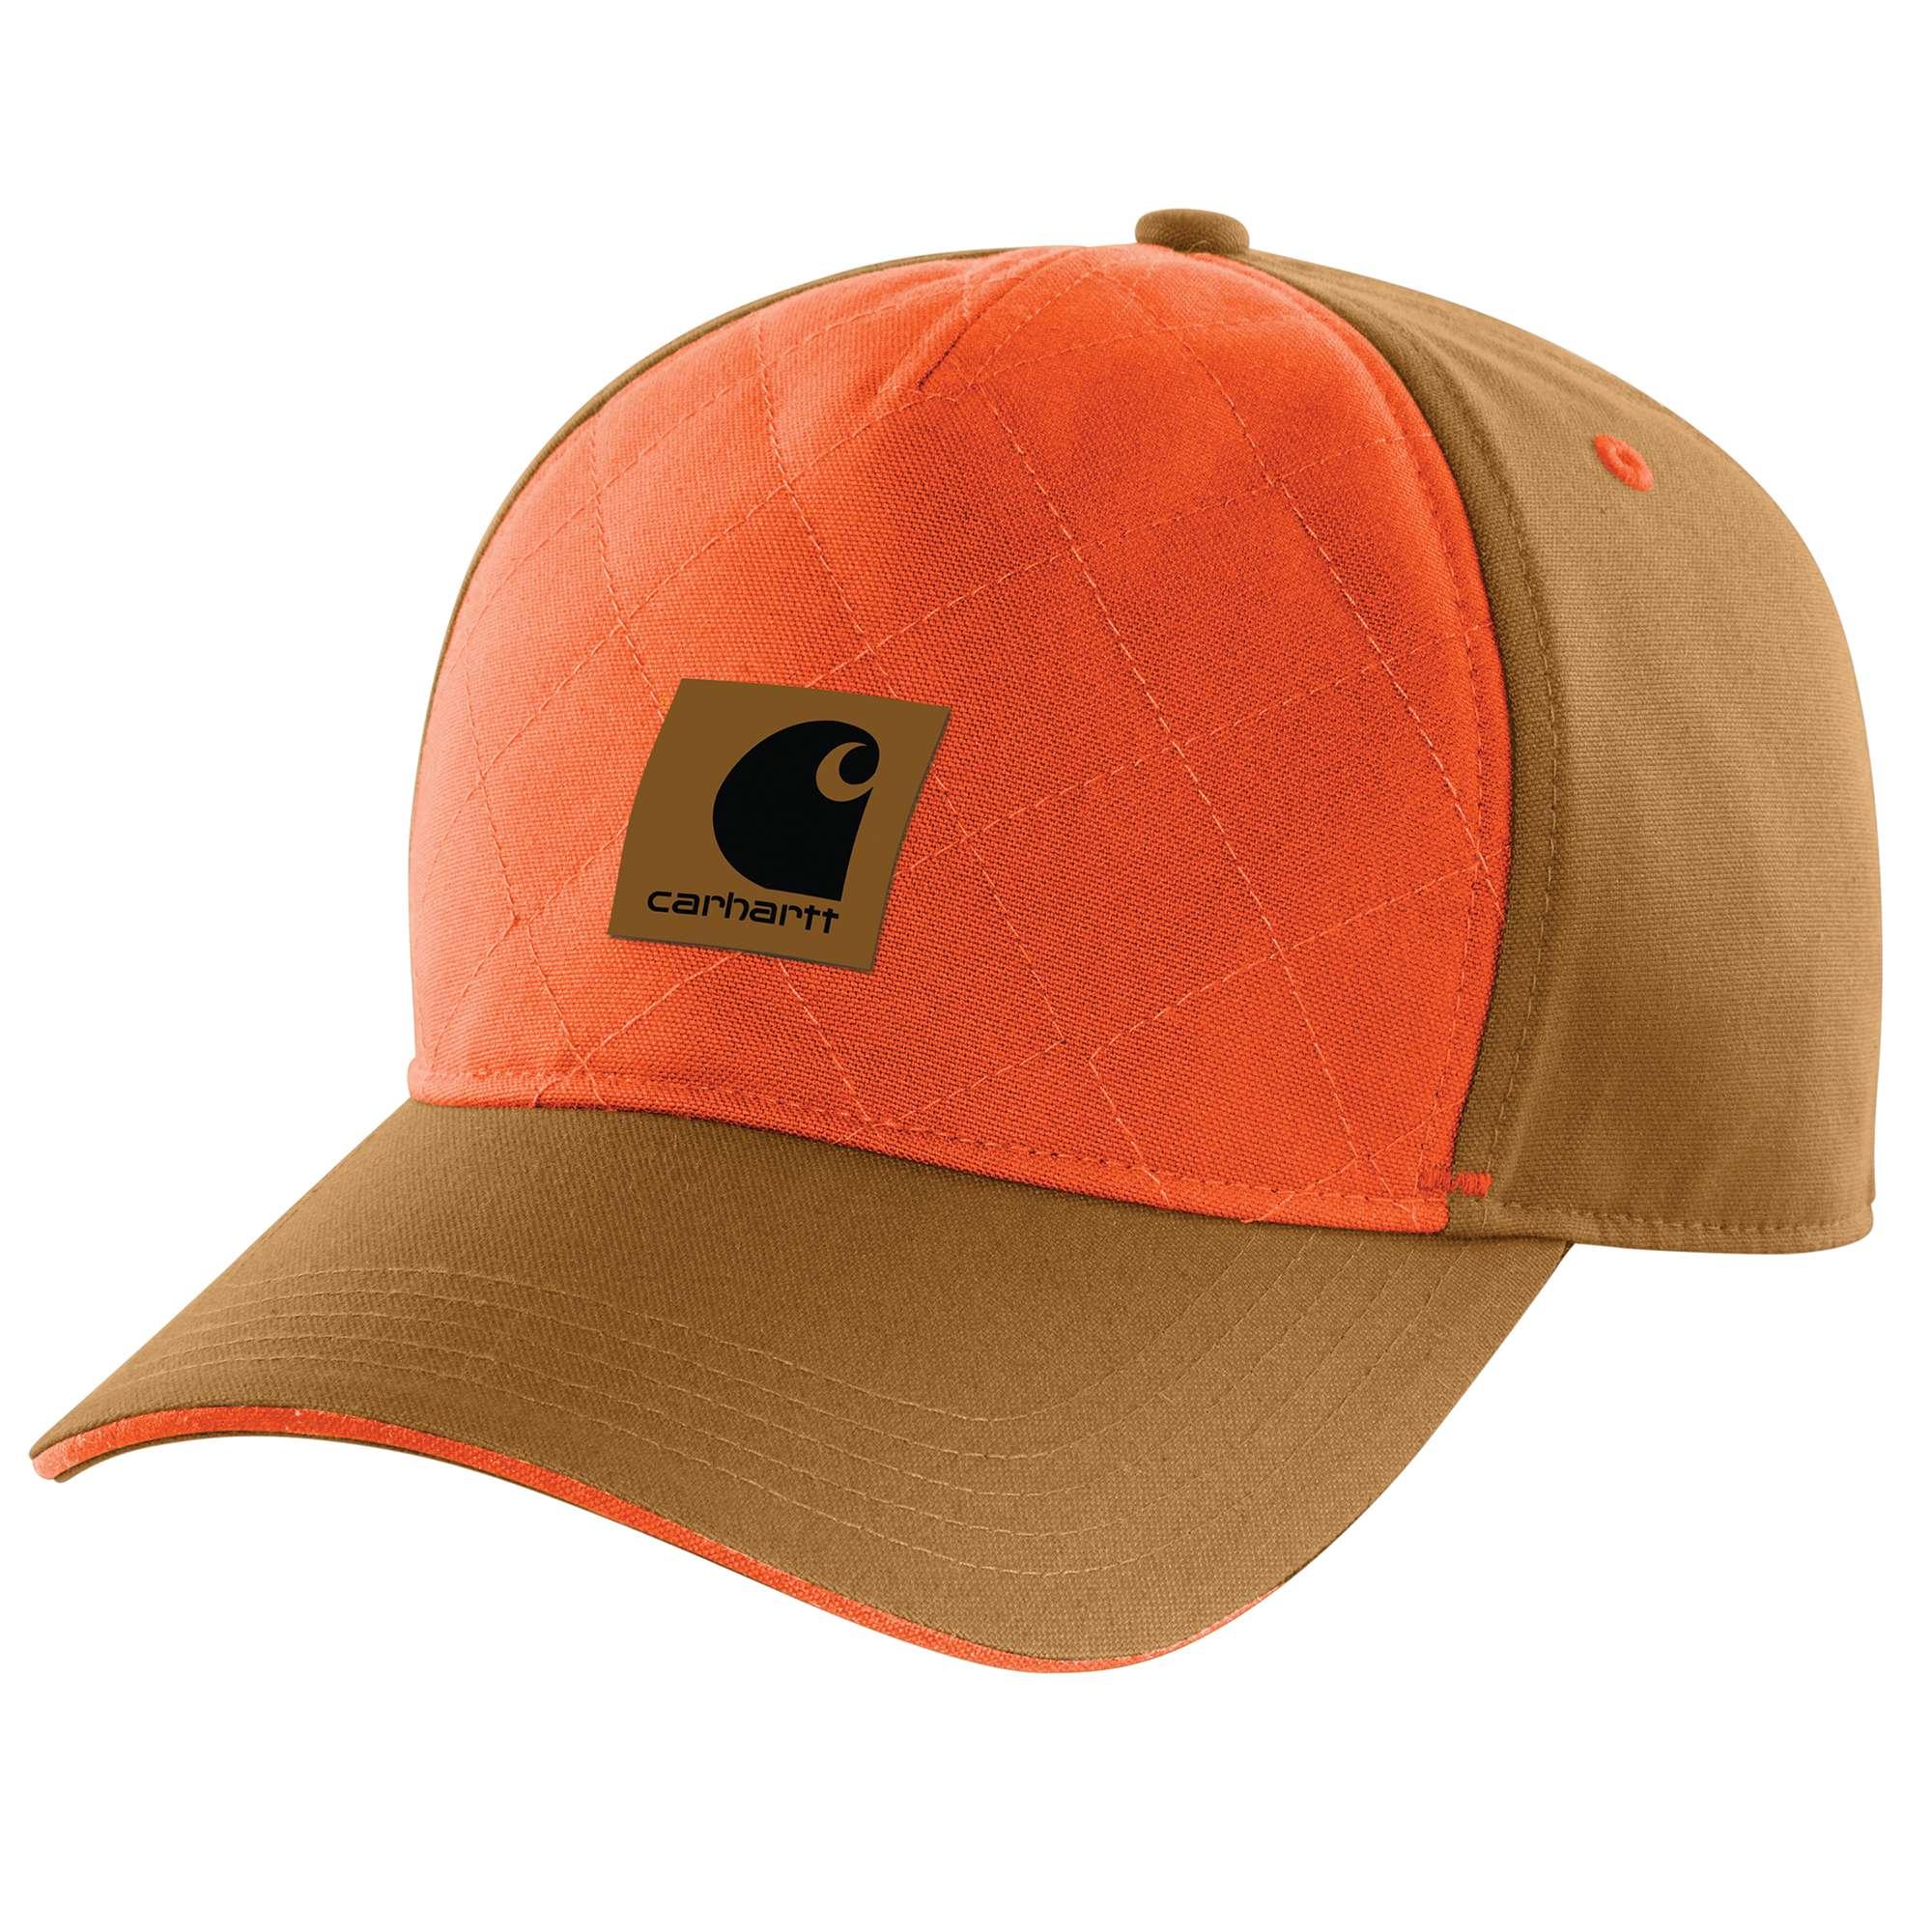 49e32e27c451b Carhartt M Ear Flap Hunting Cap - Phelps USA